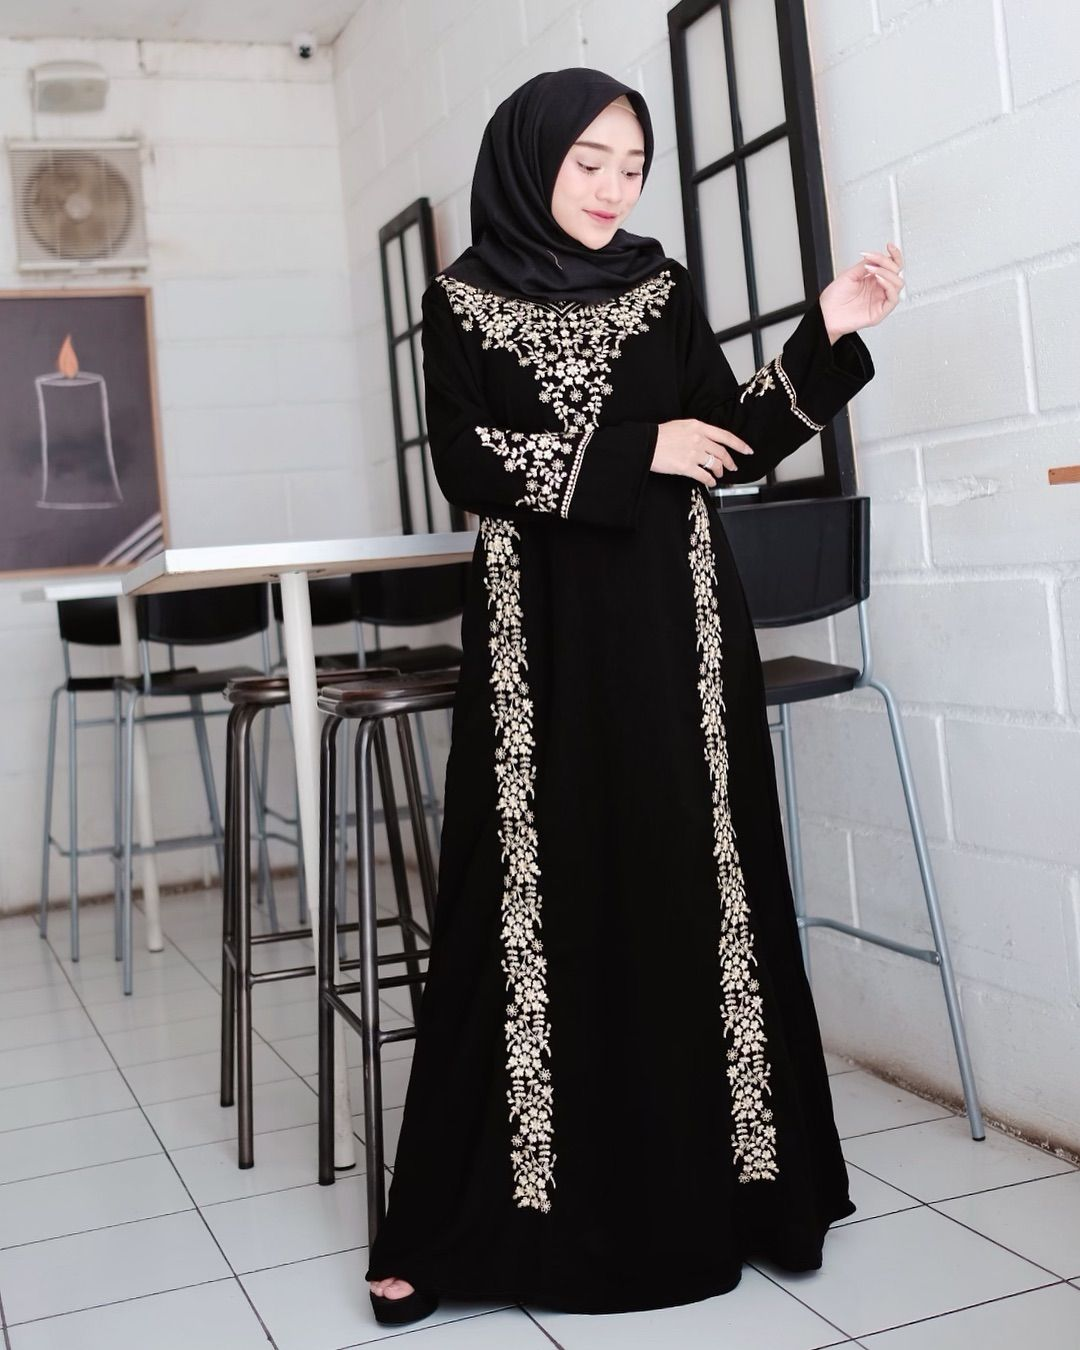 12 Pilihan Gamis Hitam yang Santun & Elegan Buat Dipakai Selama